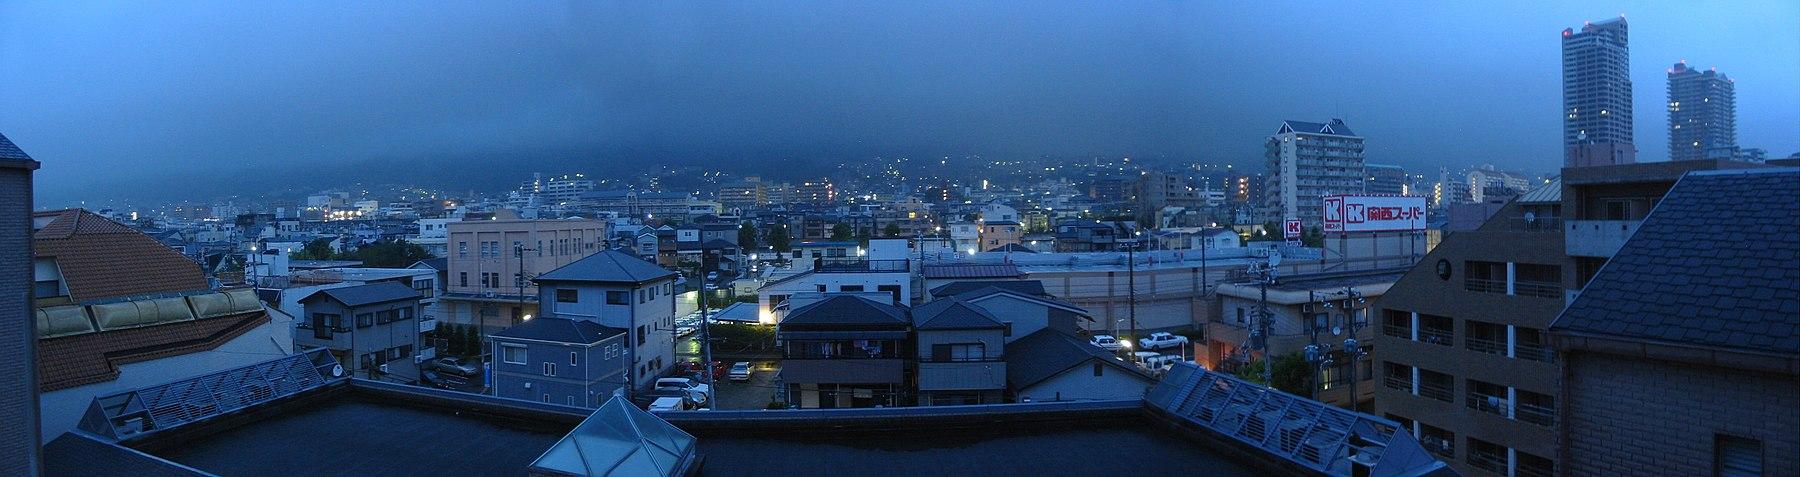 Kobe Dawn Panorama.jpg